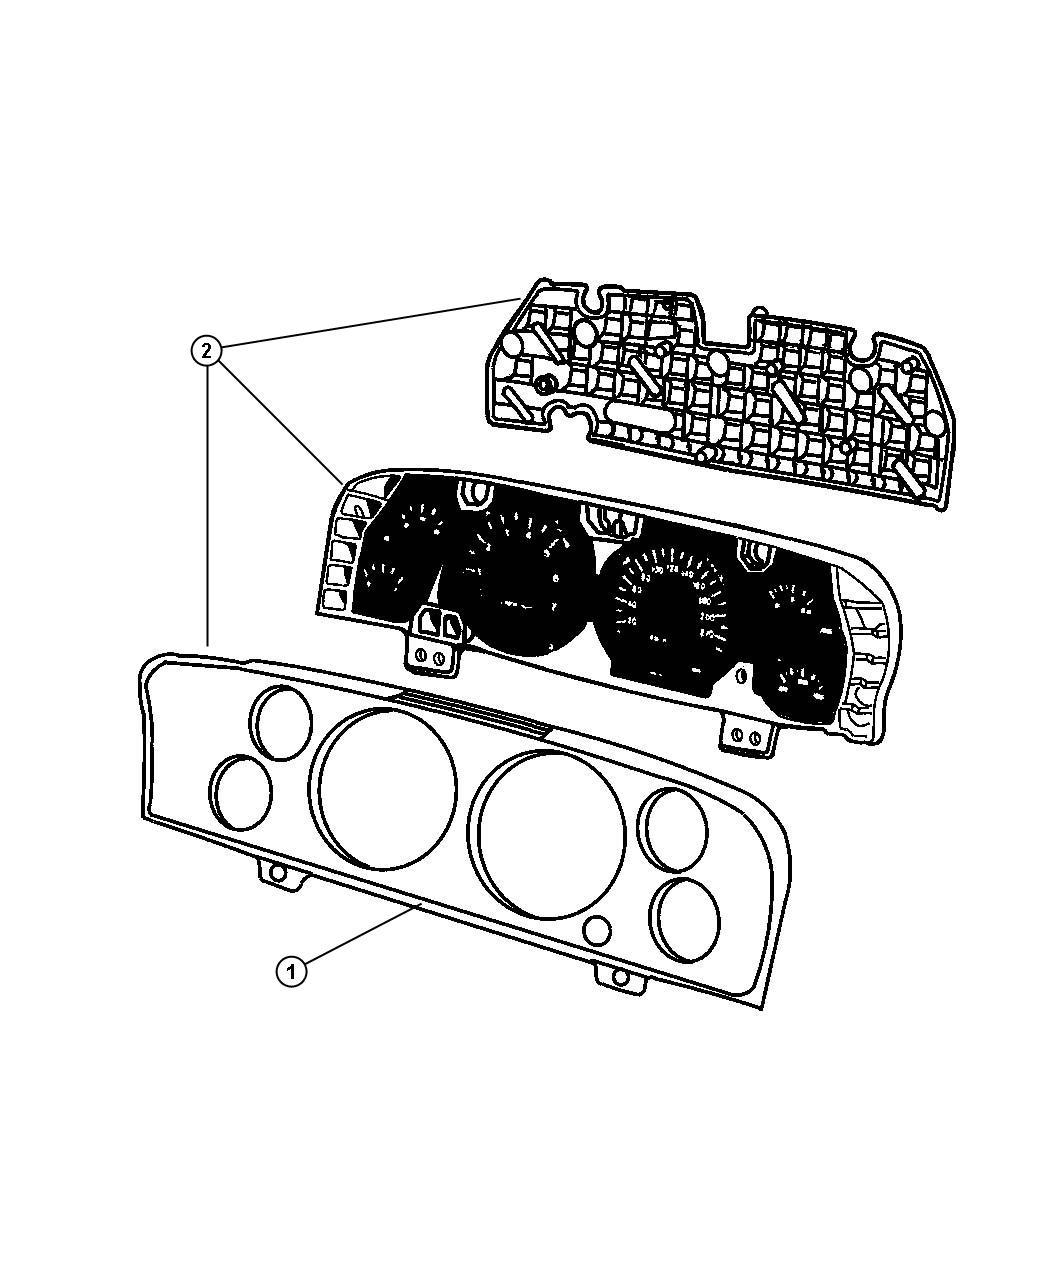 Jeep Grand Cherokee Cluster Instrument Panel 240 Kph Primary Speedometer